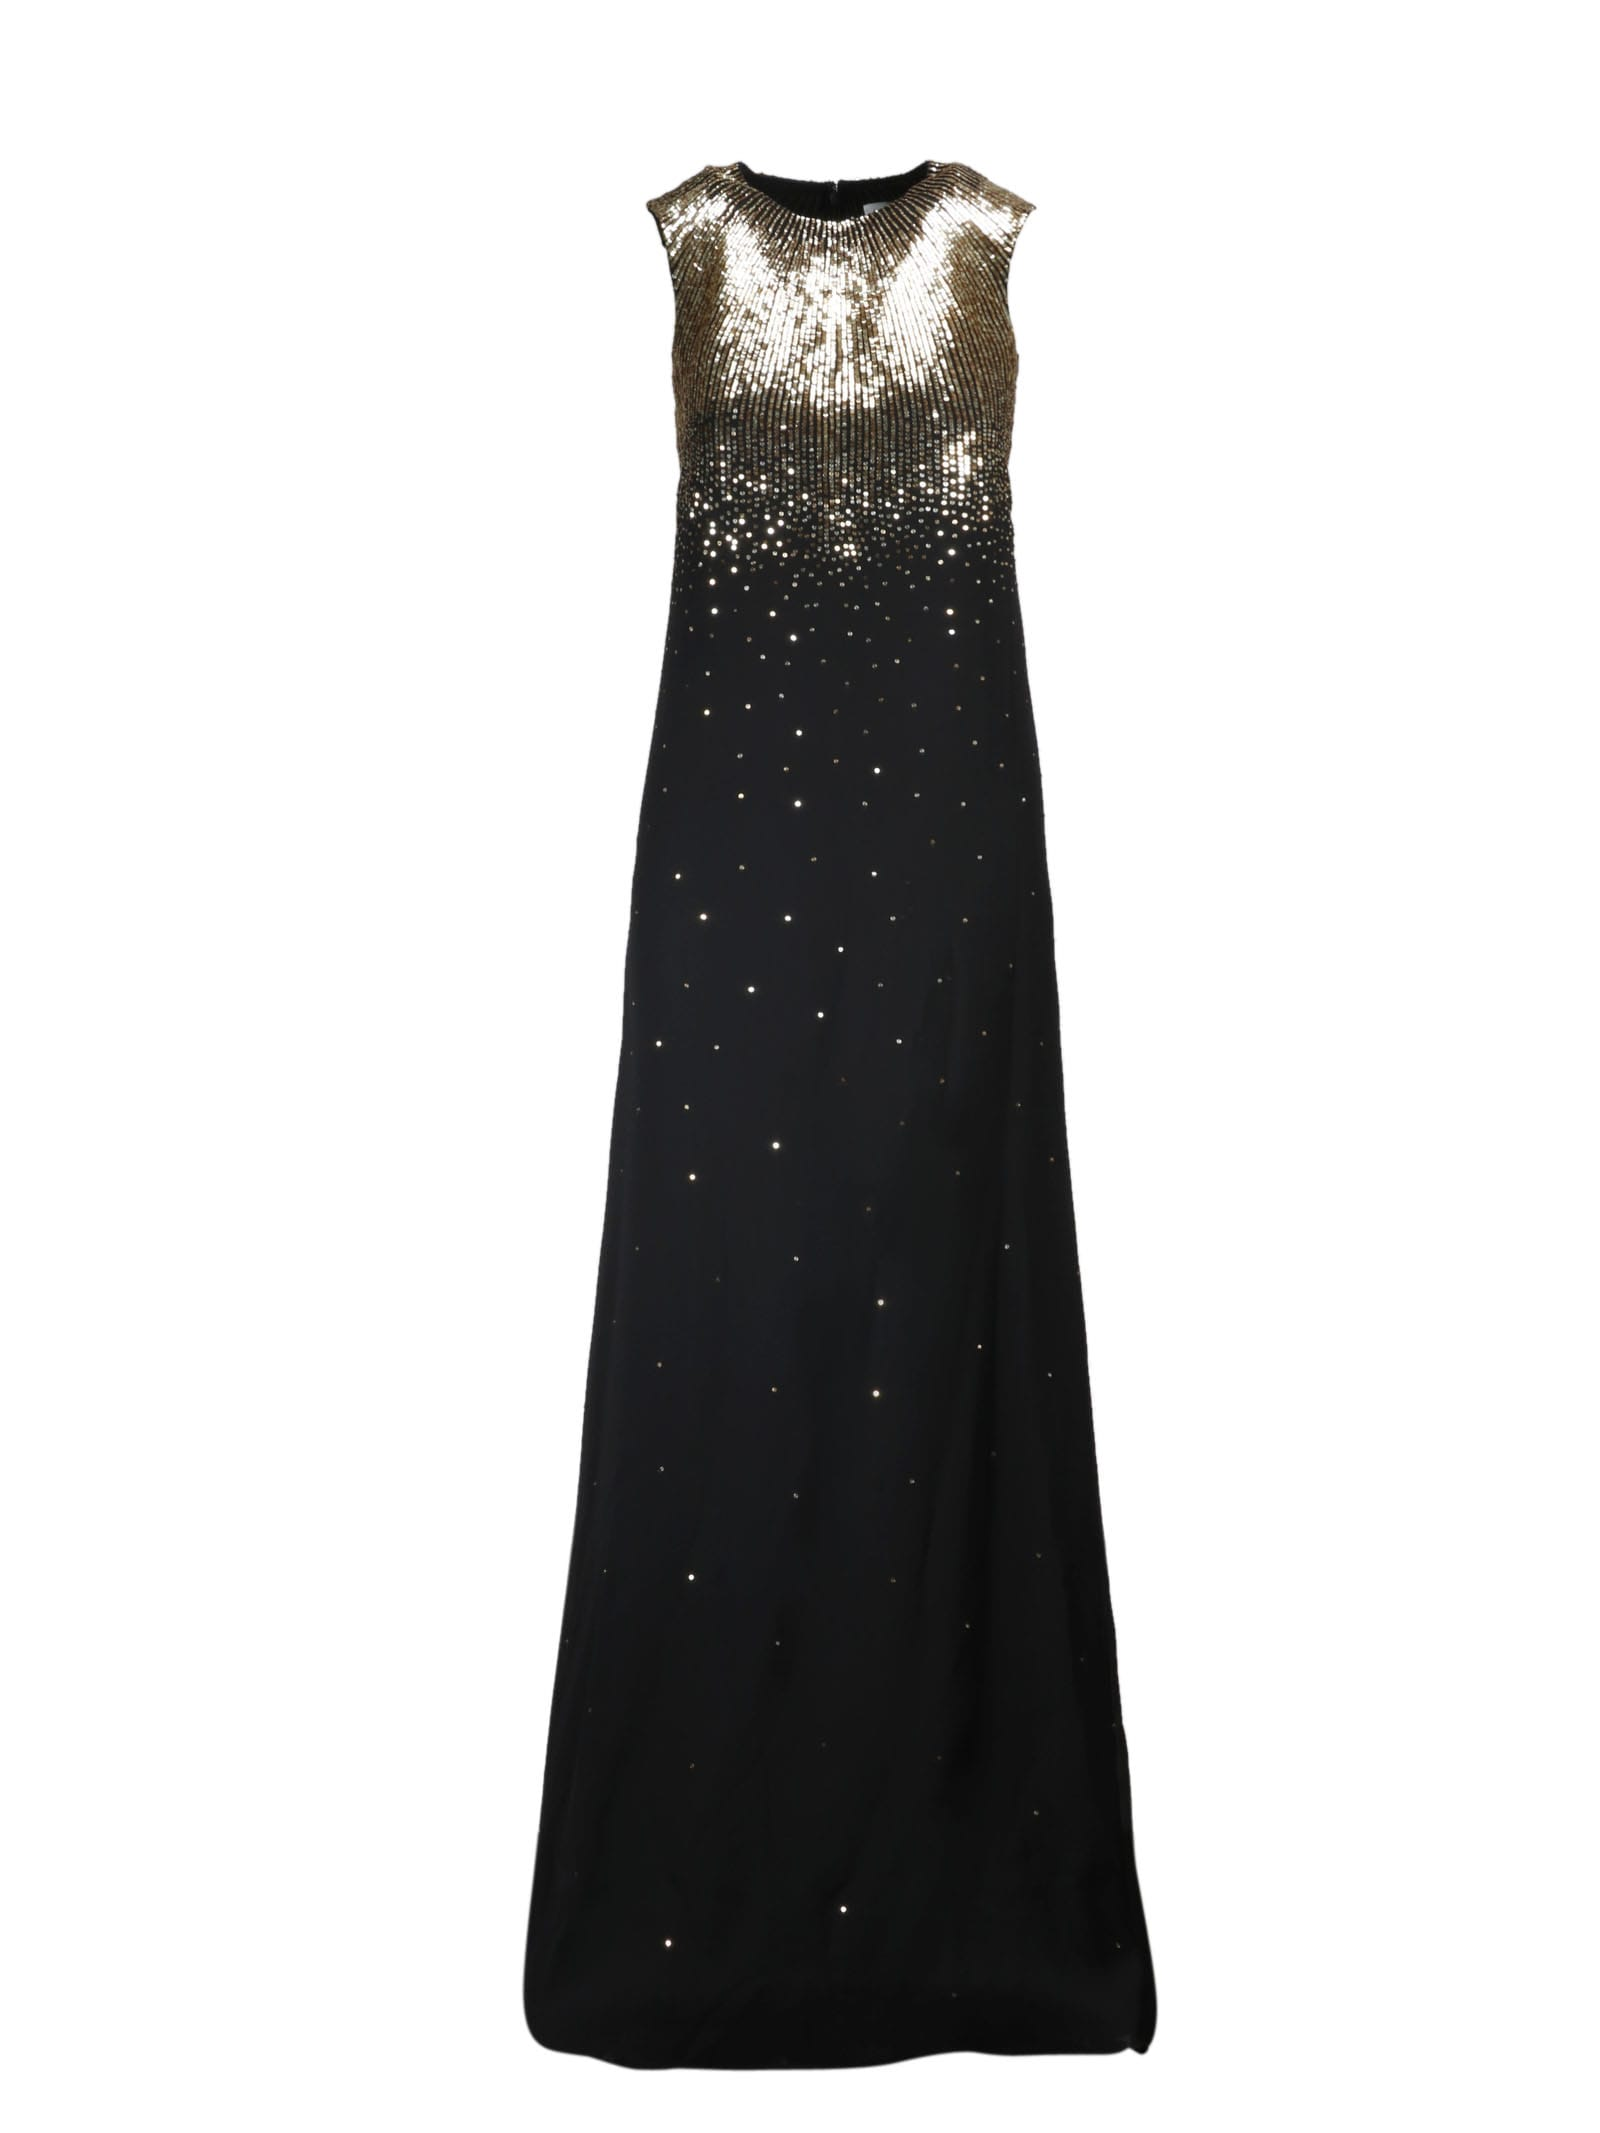 Givenchy Dress